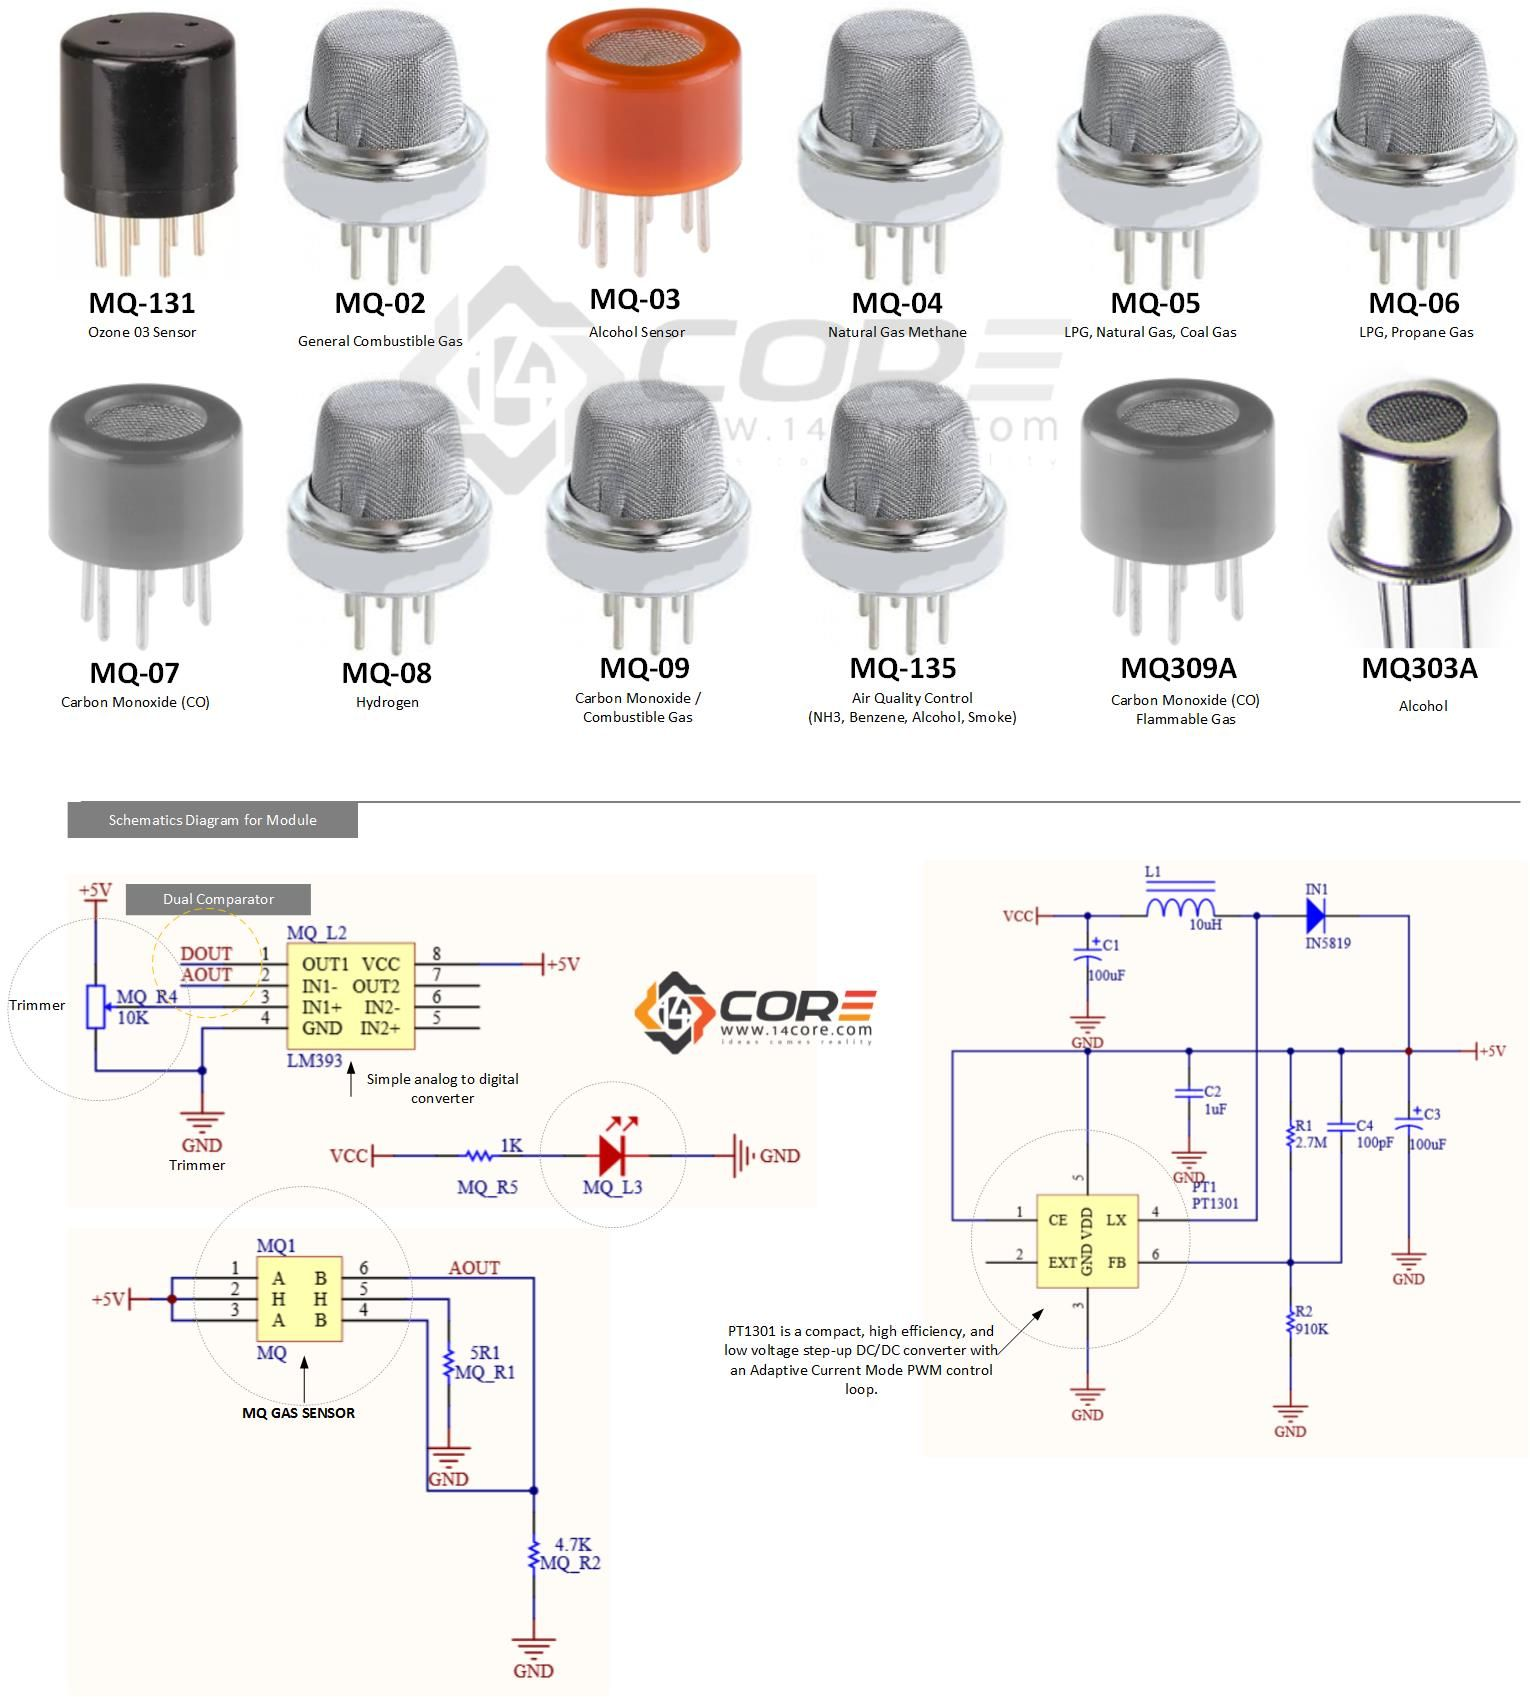 medium resolution of wiring the mq xx sensor for ozone lpg c3h8 co h c2h6o c6h6 gas detection on stm32f 14core com